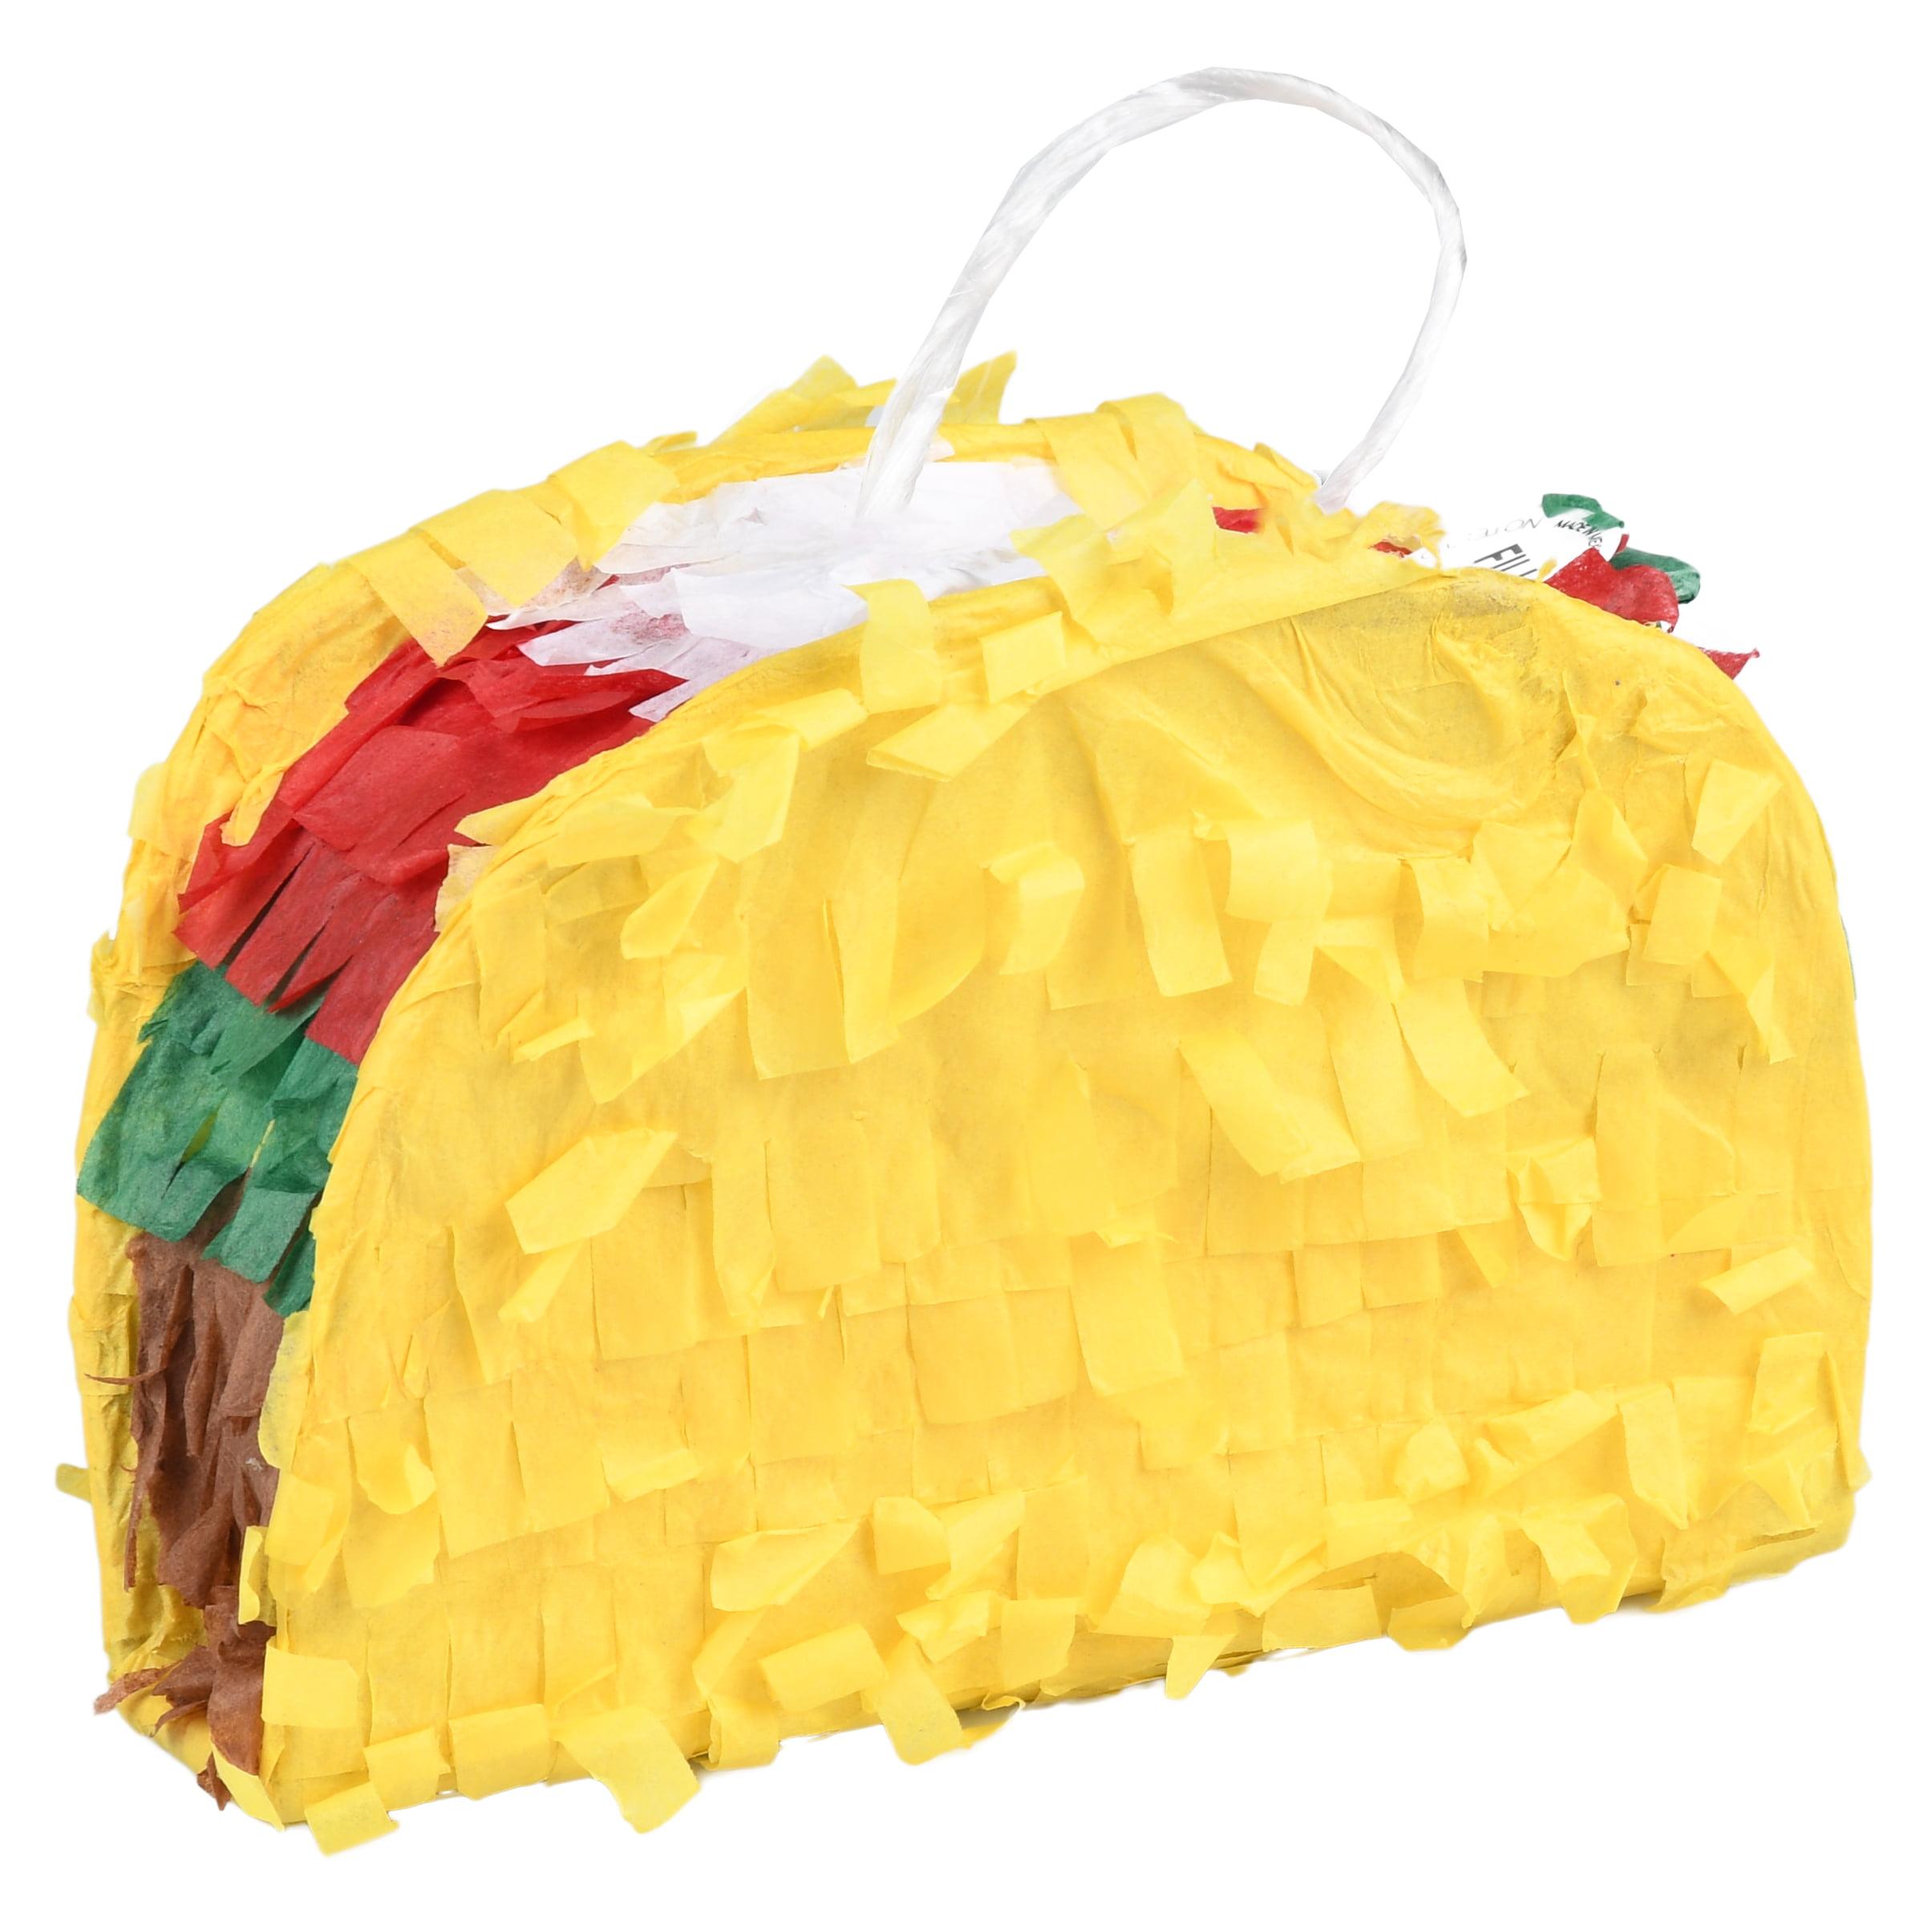 Extra Mini Taco Party Pinata Yellow Mini Party Decoration 6in X 6in Walmart Com Walmart Com